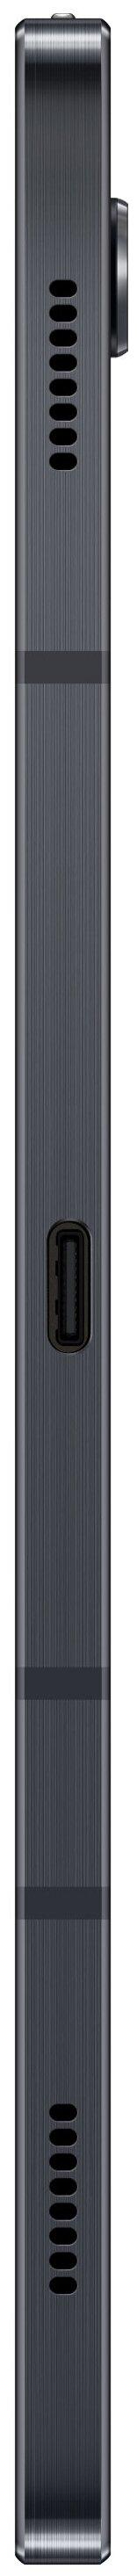 Samsung Galaxy Tab S7 11 SM-T870 128Gb Wi-Fi (2020) - операционная система: Android 10